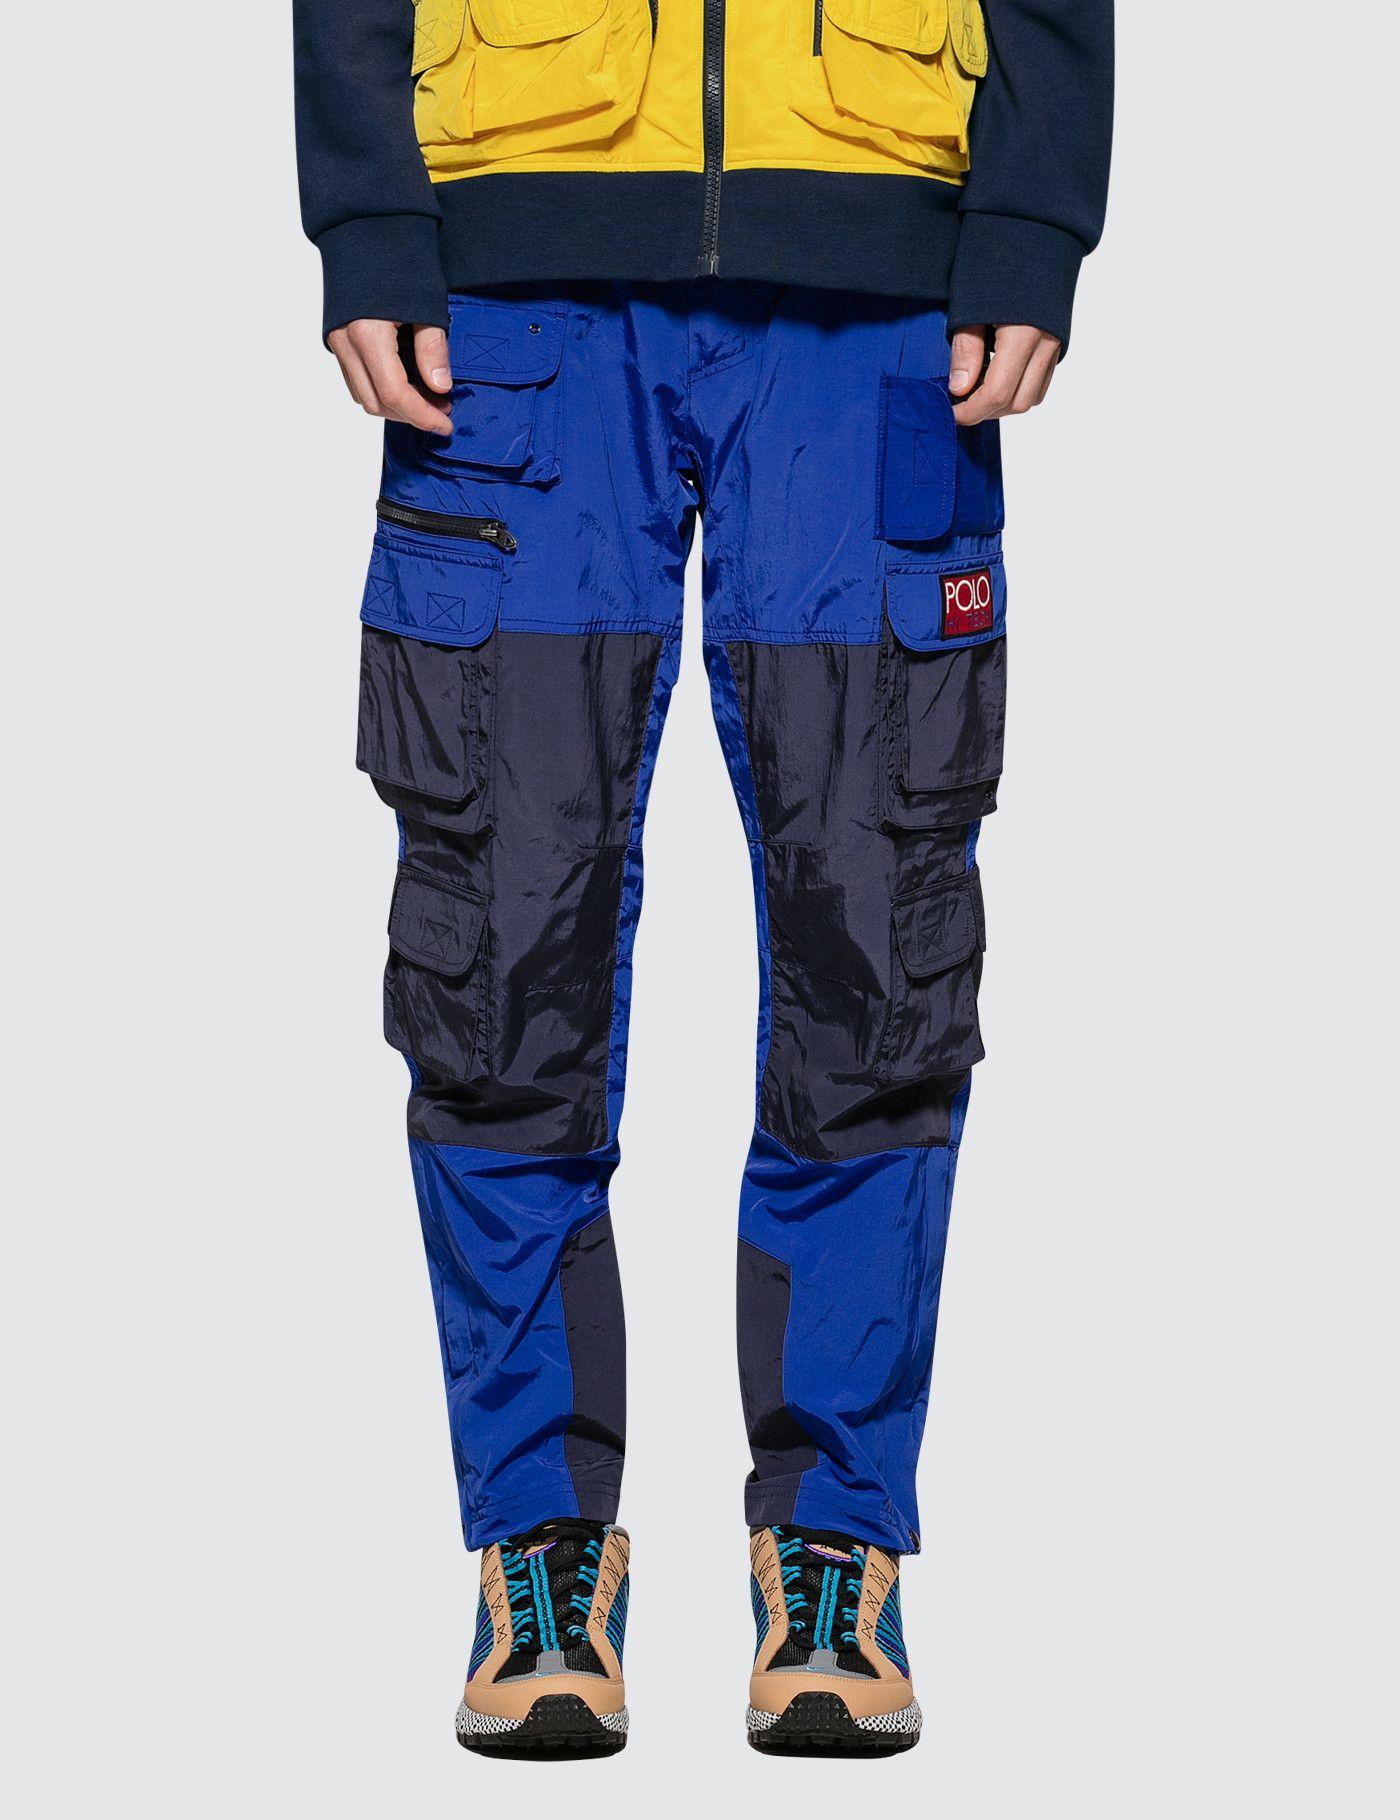 Hi tech pant polo ralph lauren pants mens sweatpants